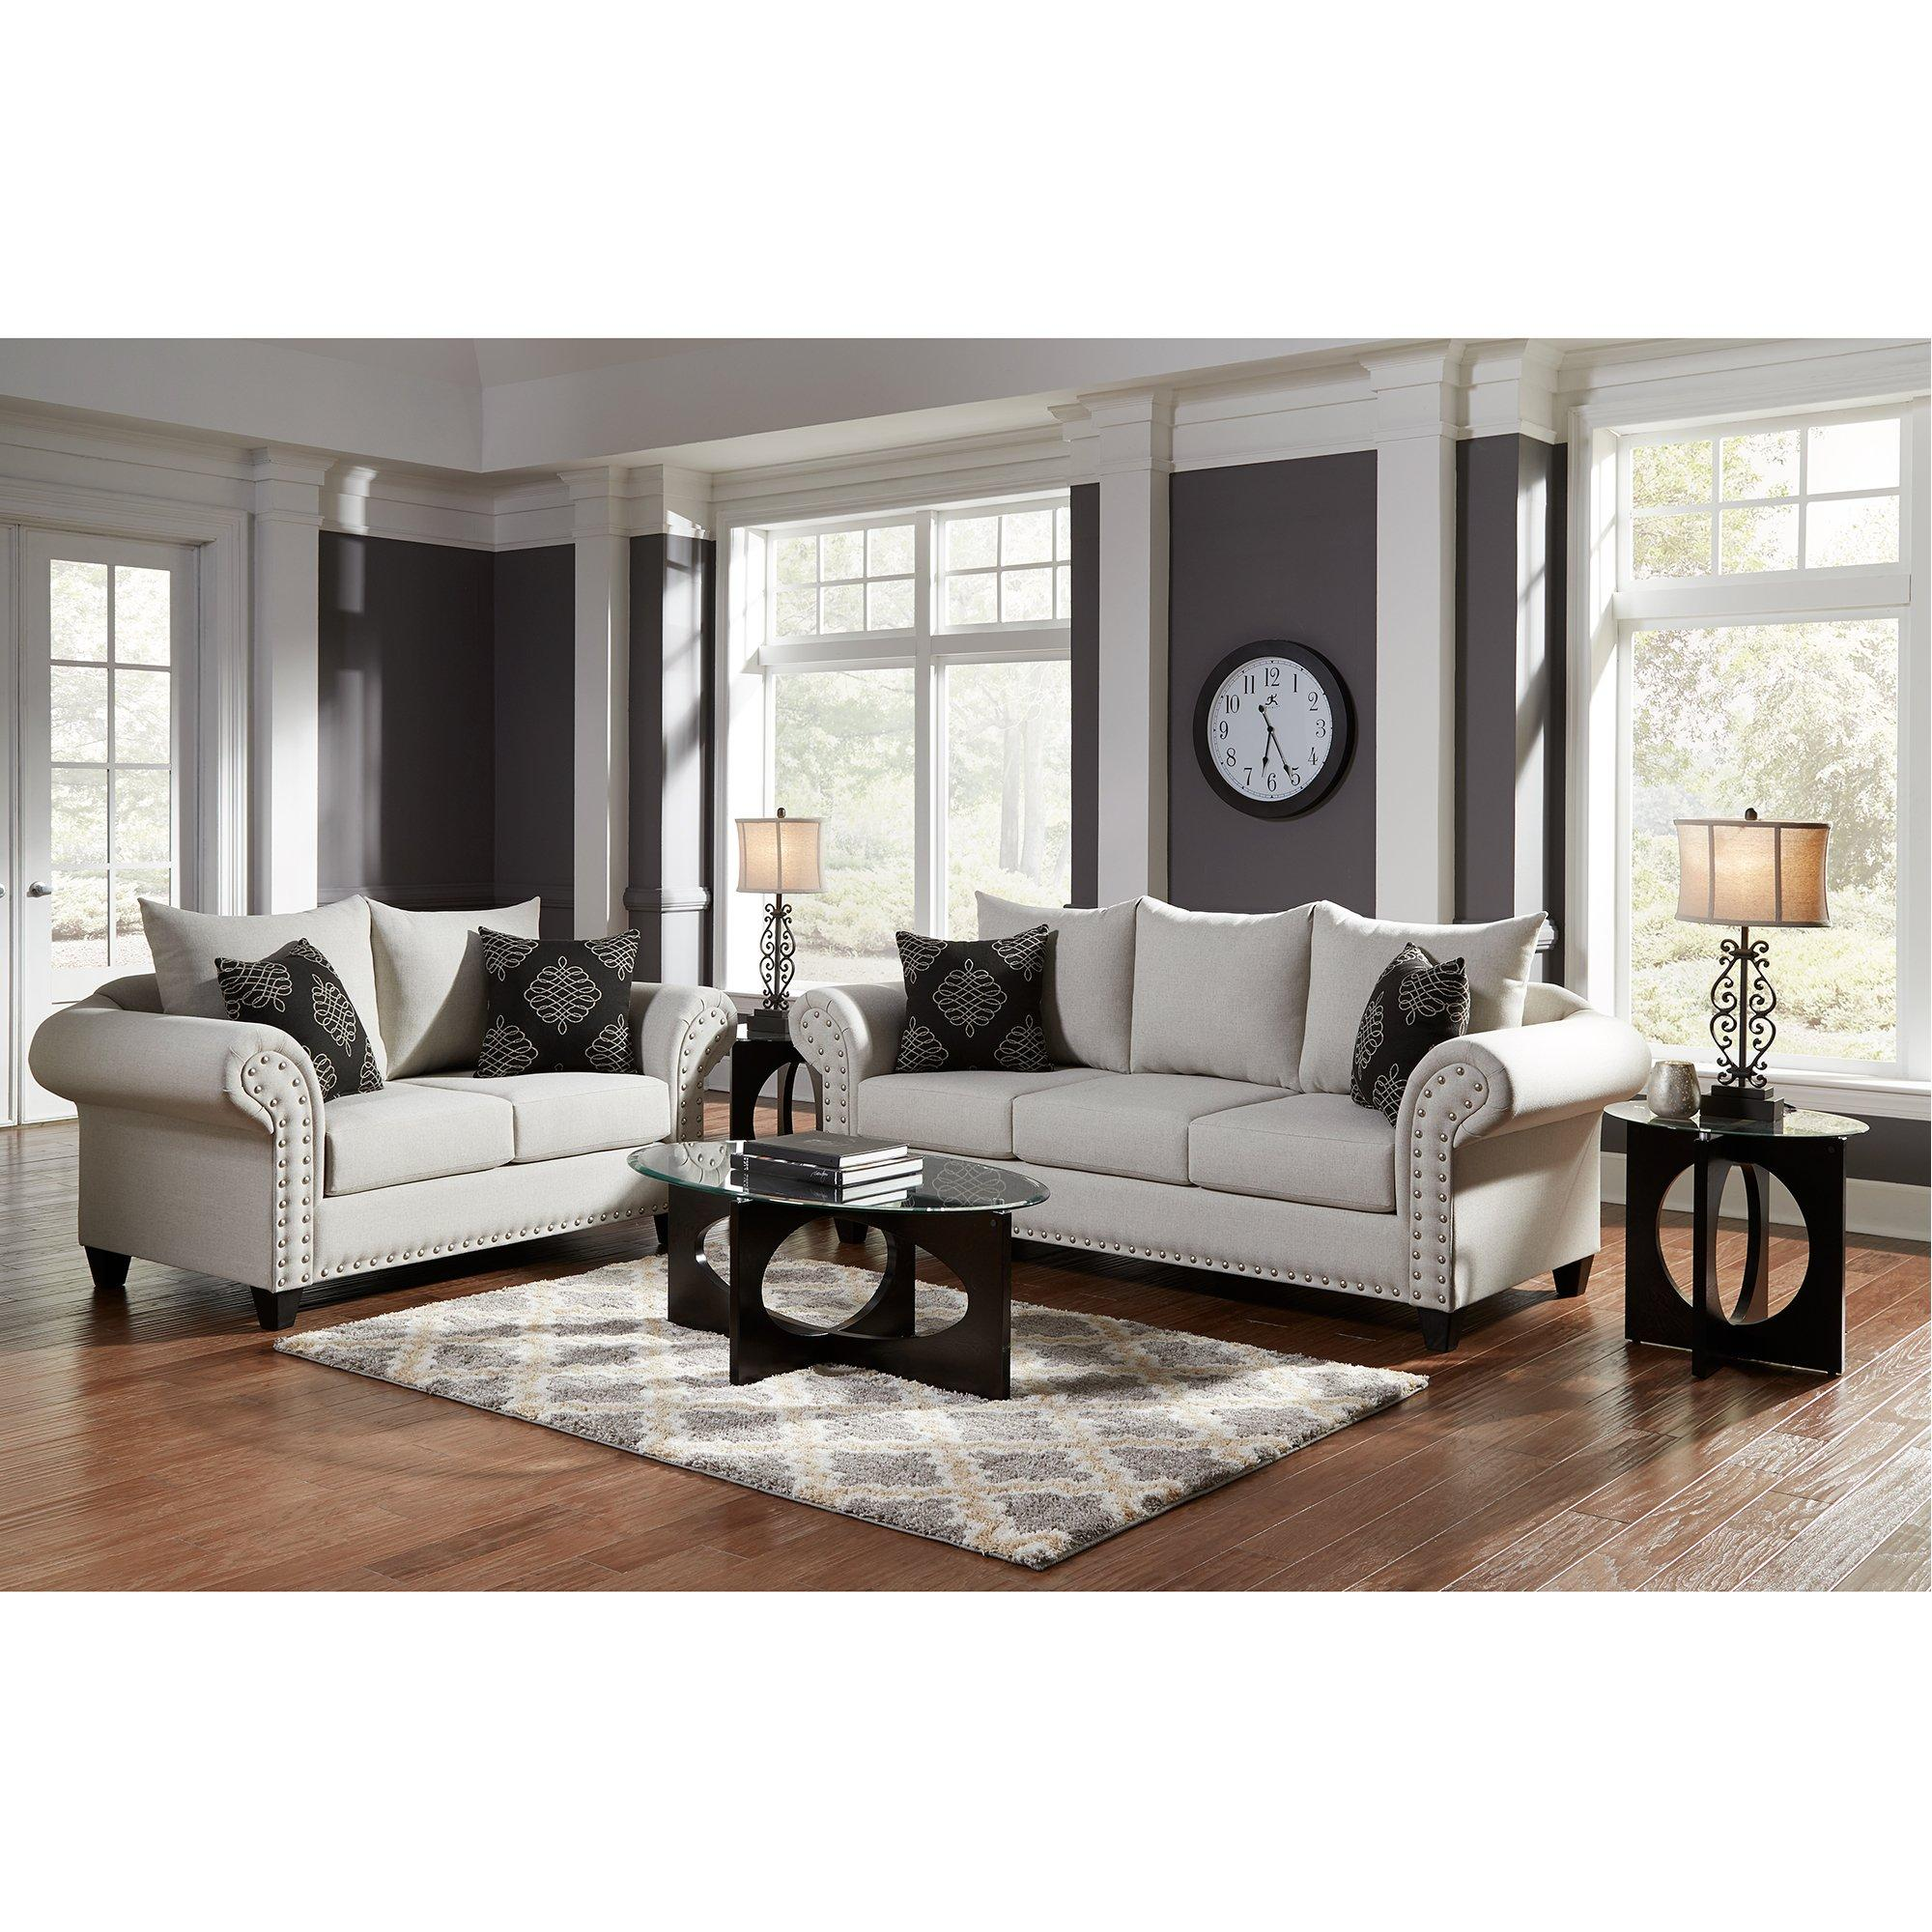 Aarons Living Room Furniture Photos, Aarons Living Room Sets